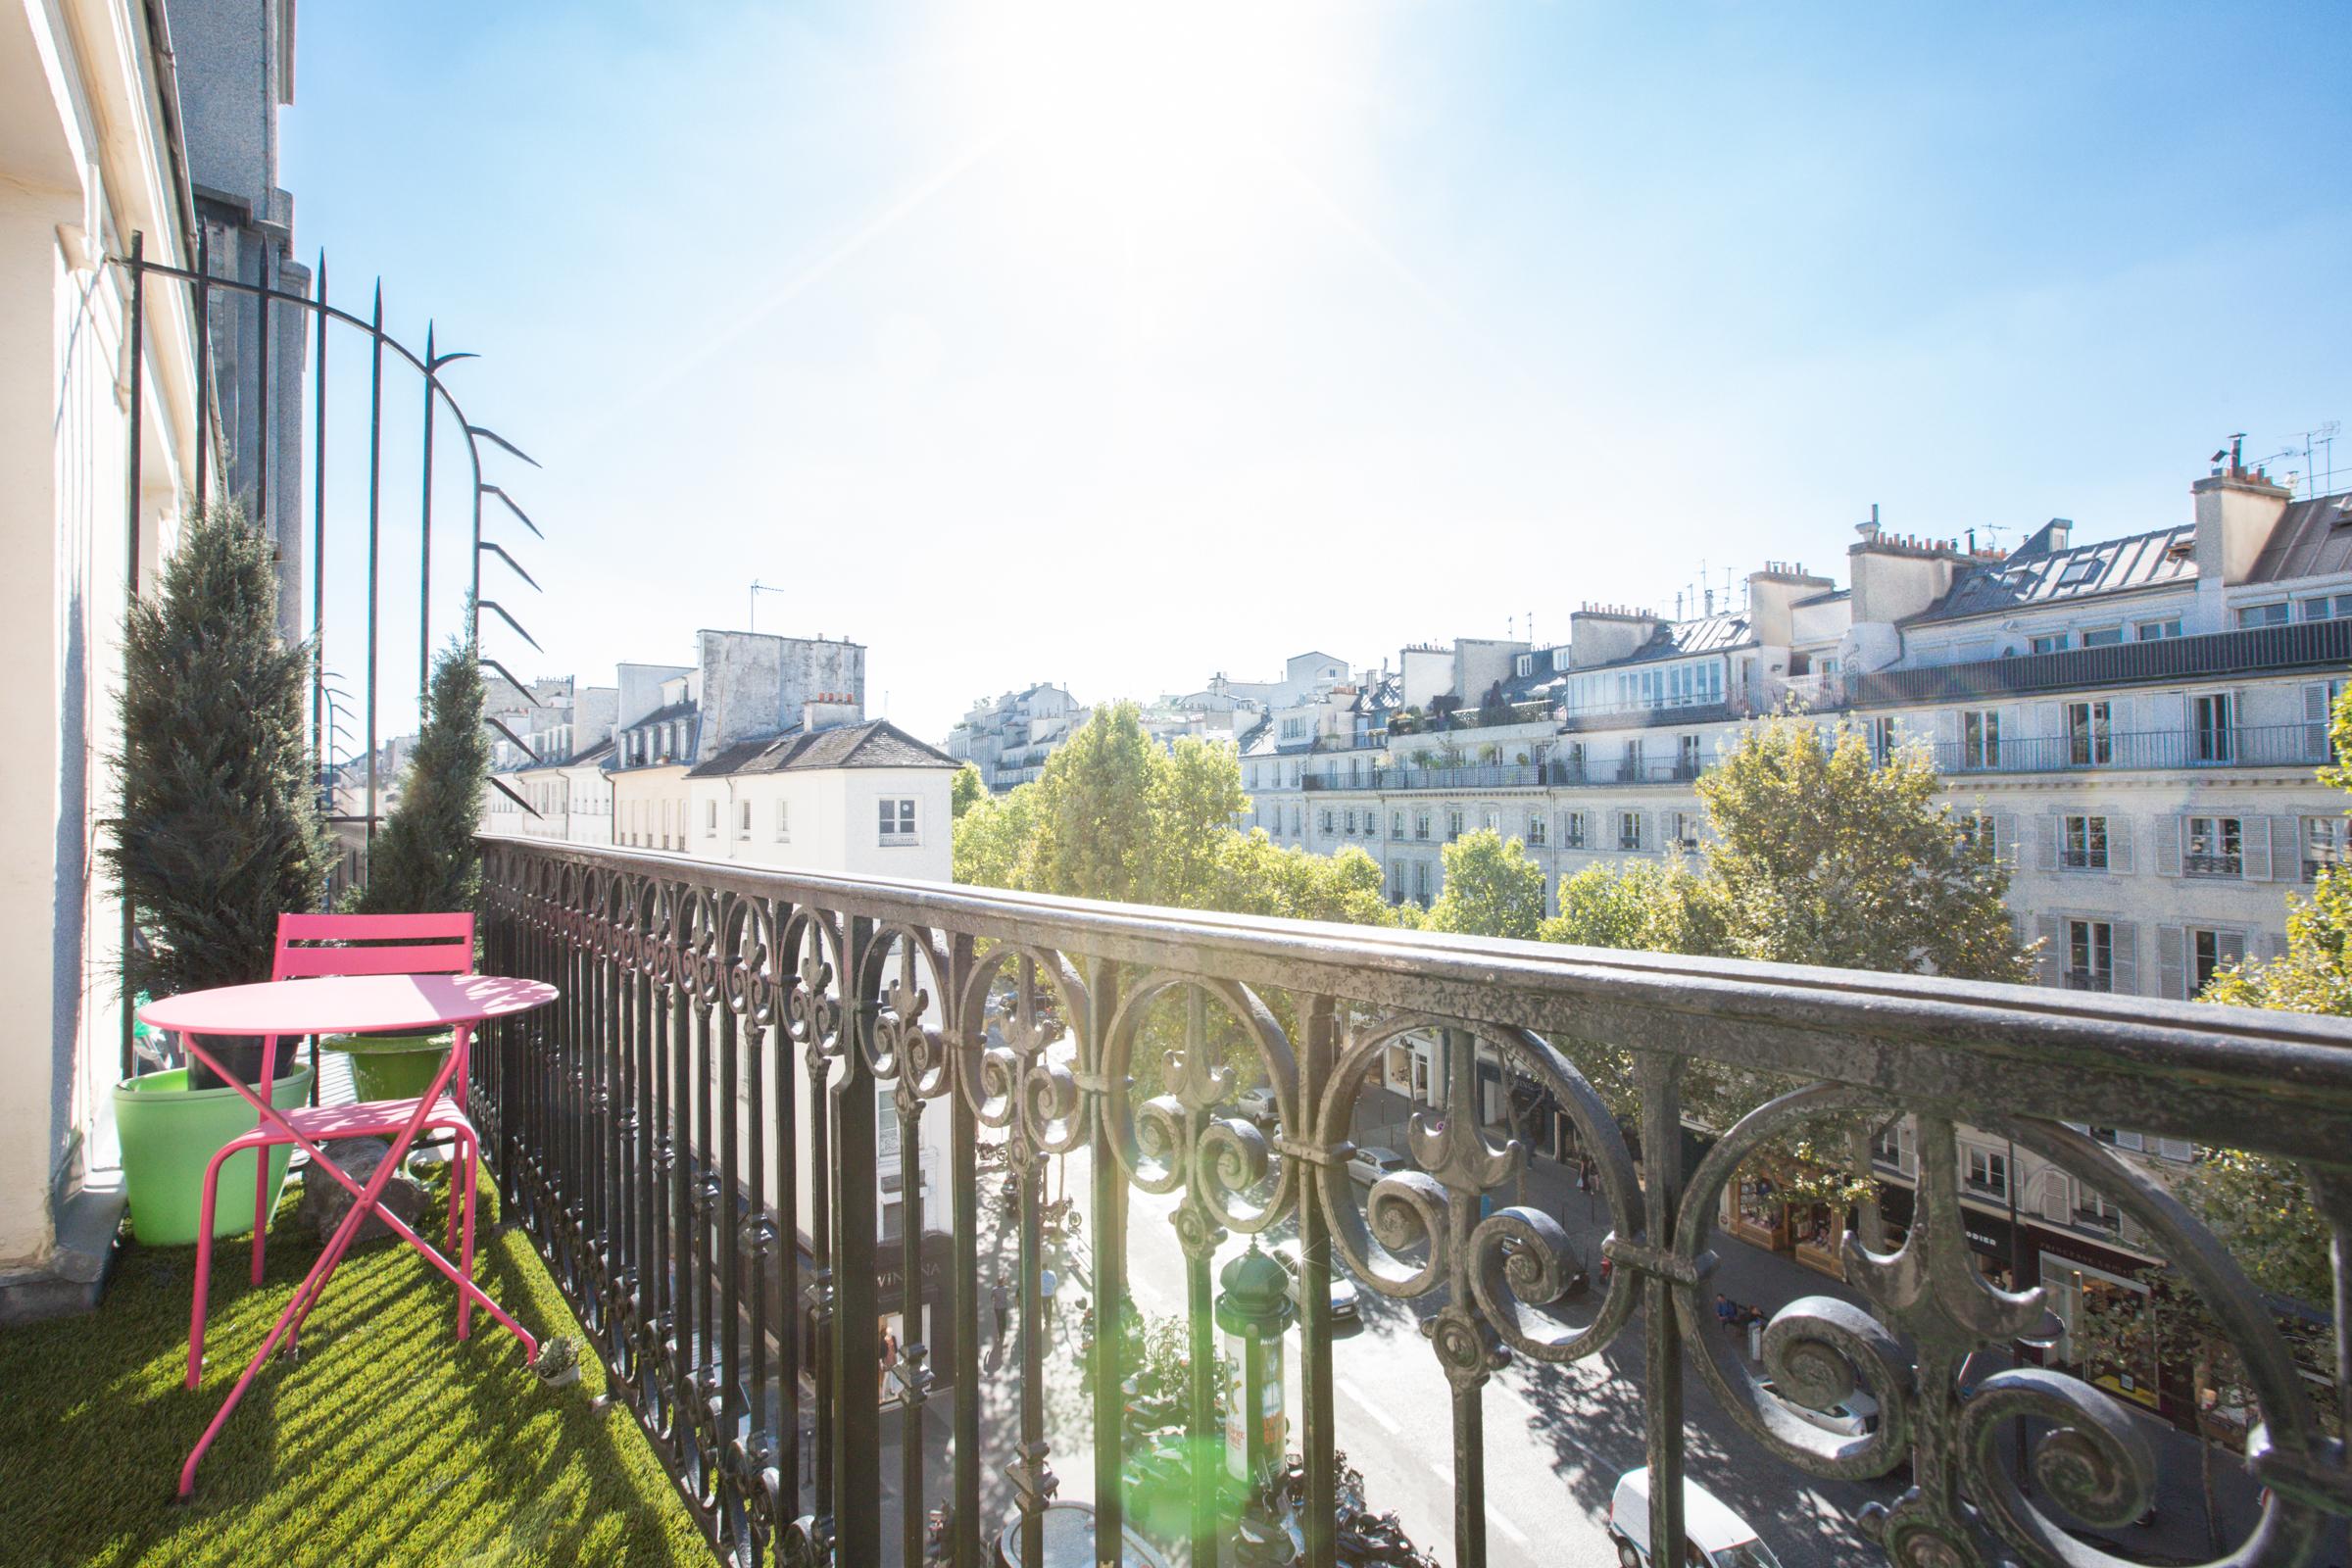 Căn hộ vì Bán tại Apartment - Madeleine/Tronchet Paris, Paris 75009 Pháp